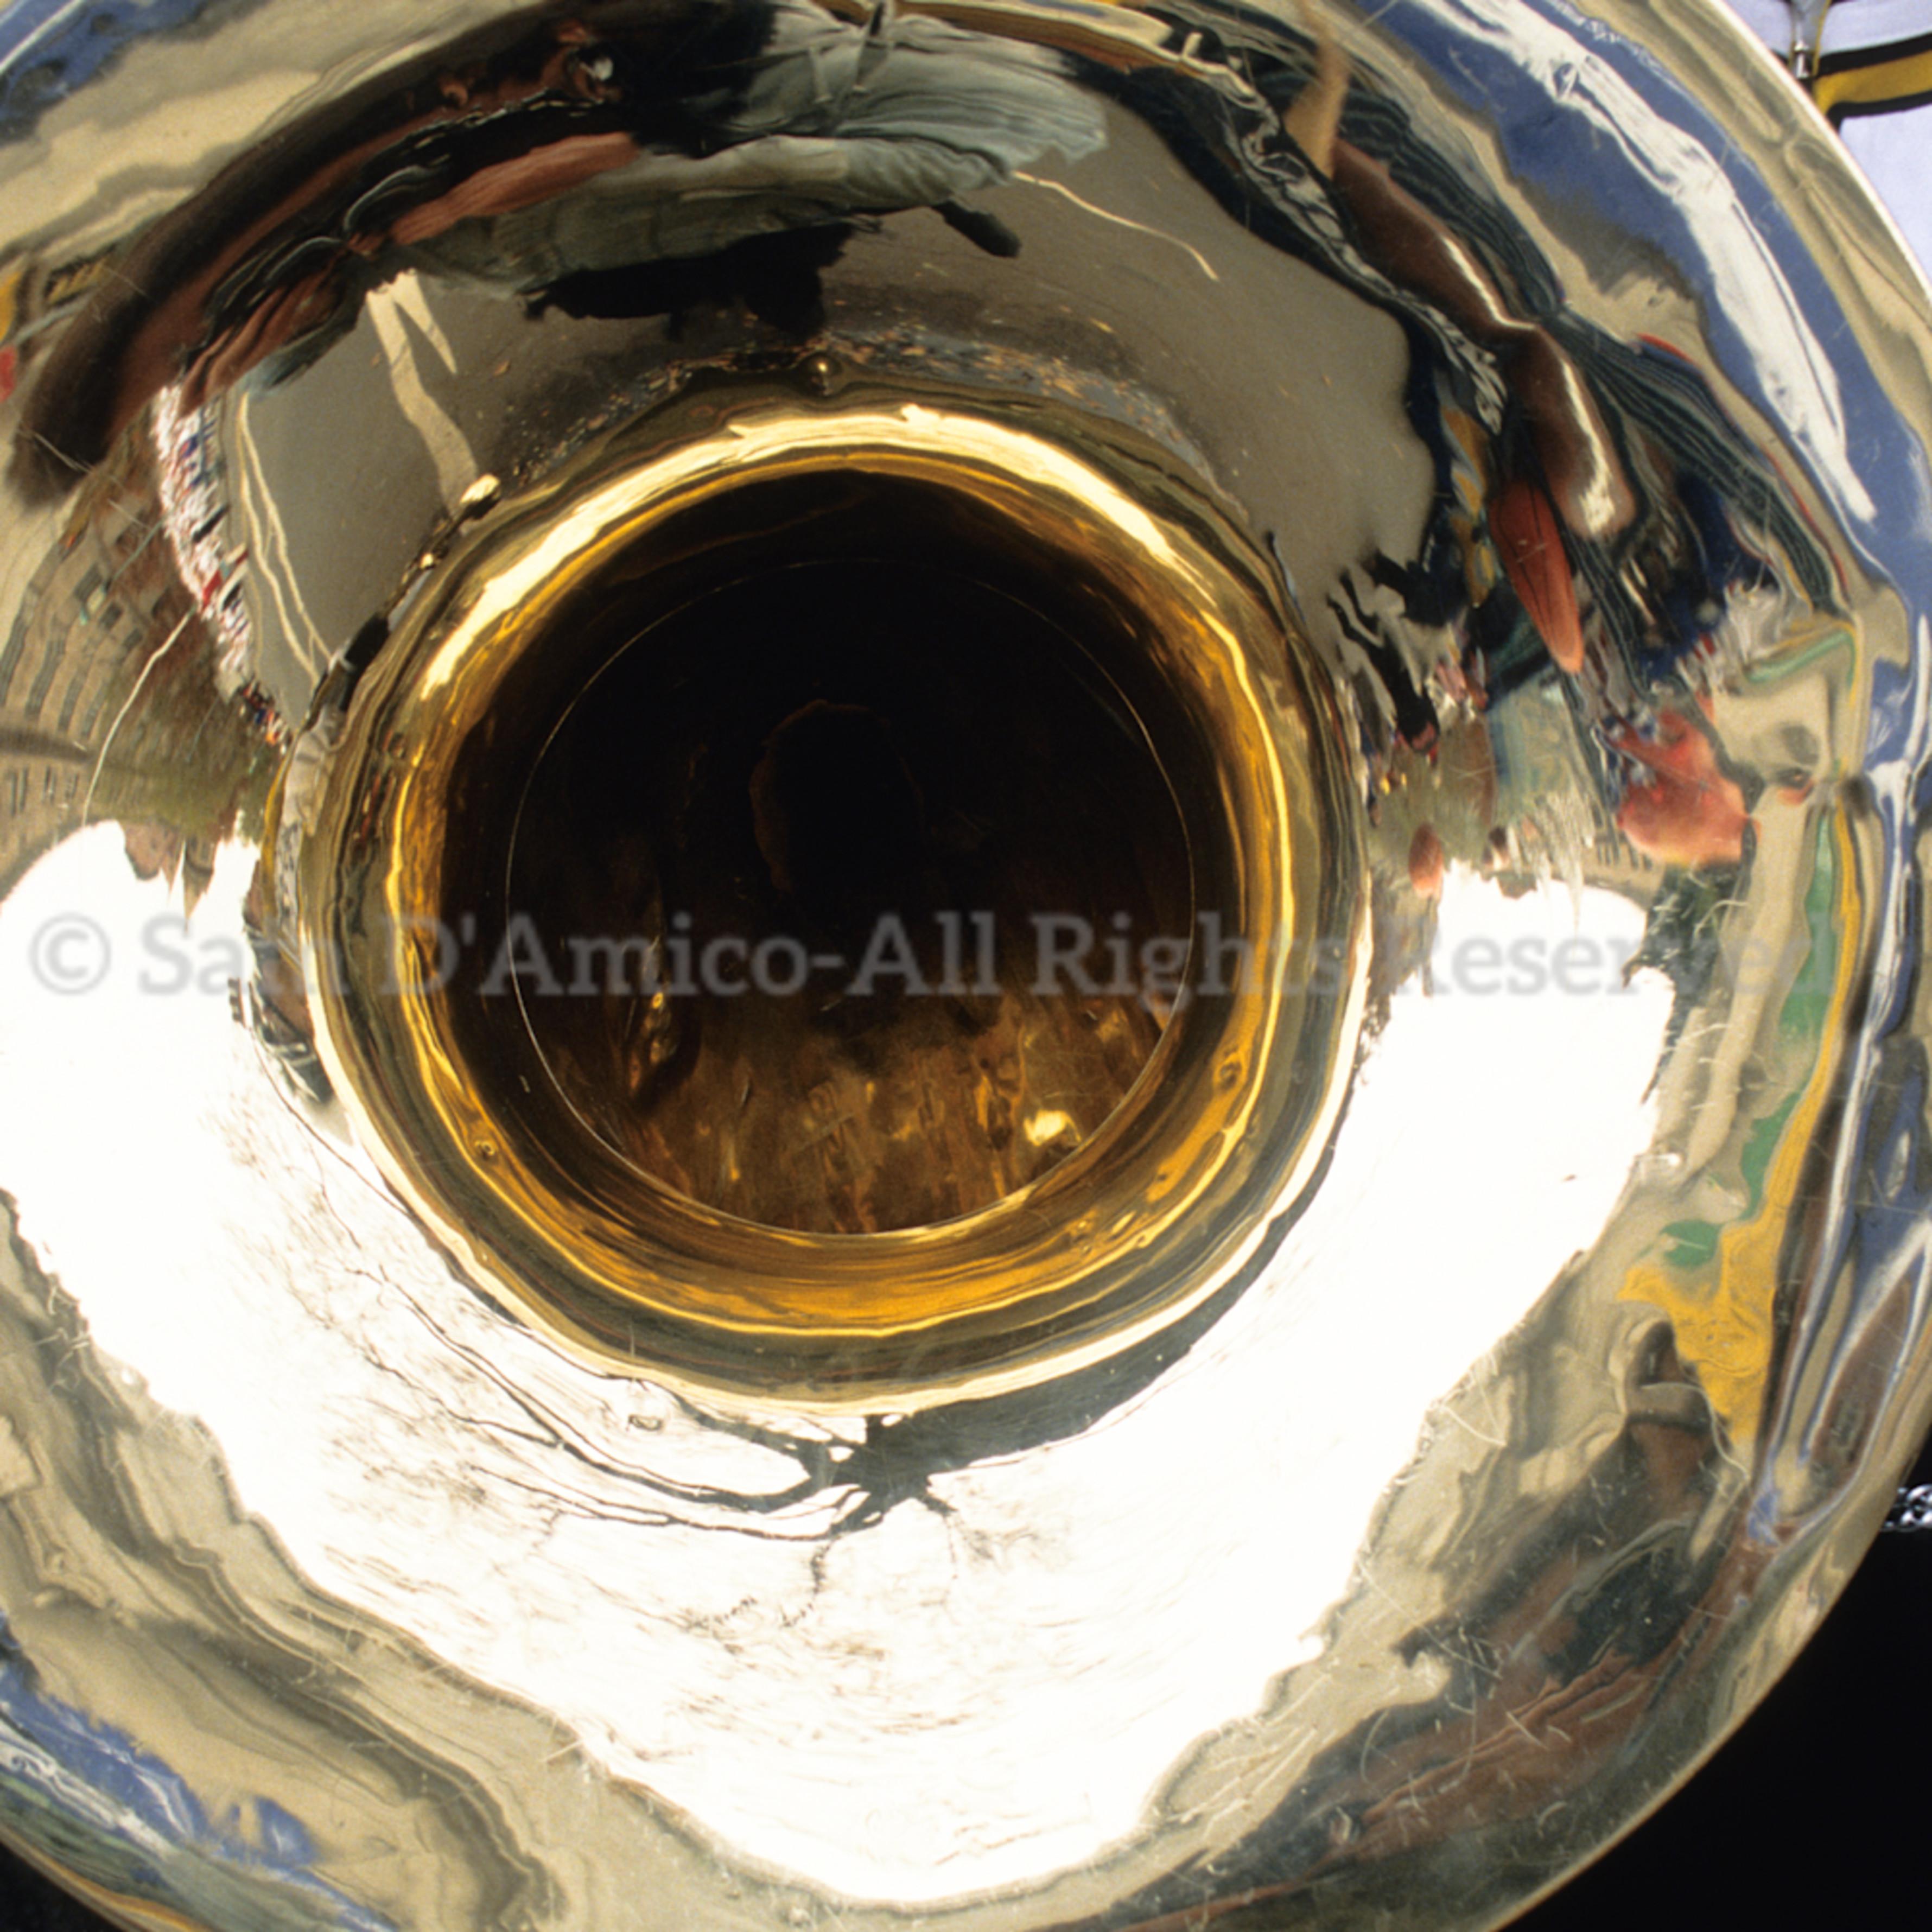 Musician uniform holds tuba lehkie